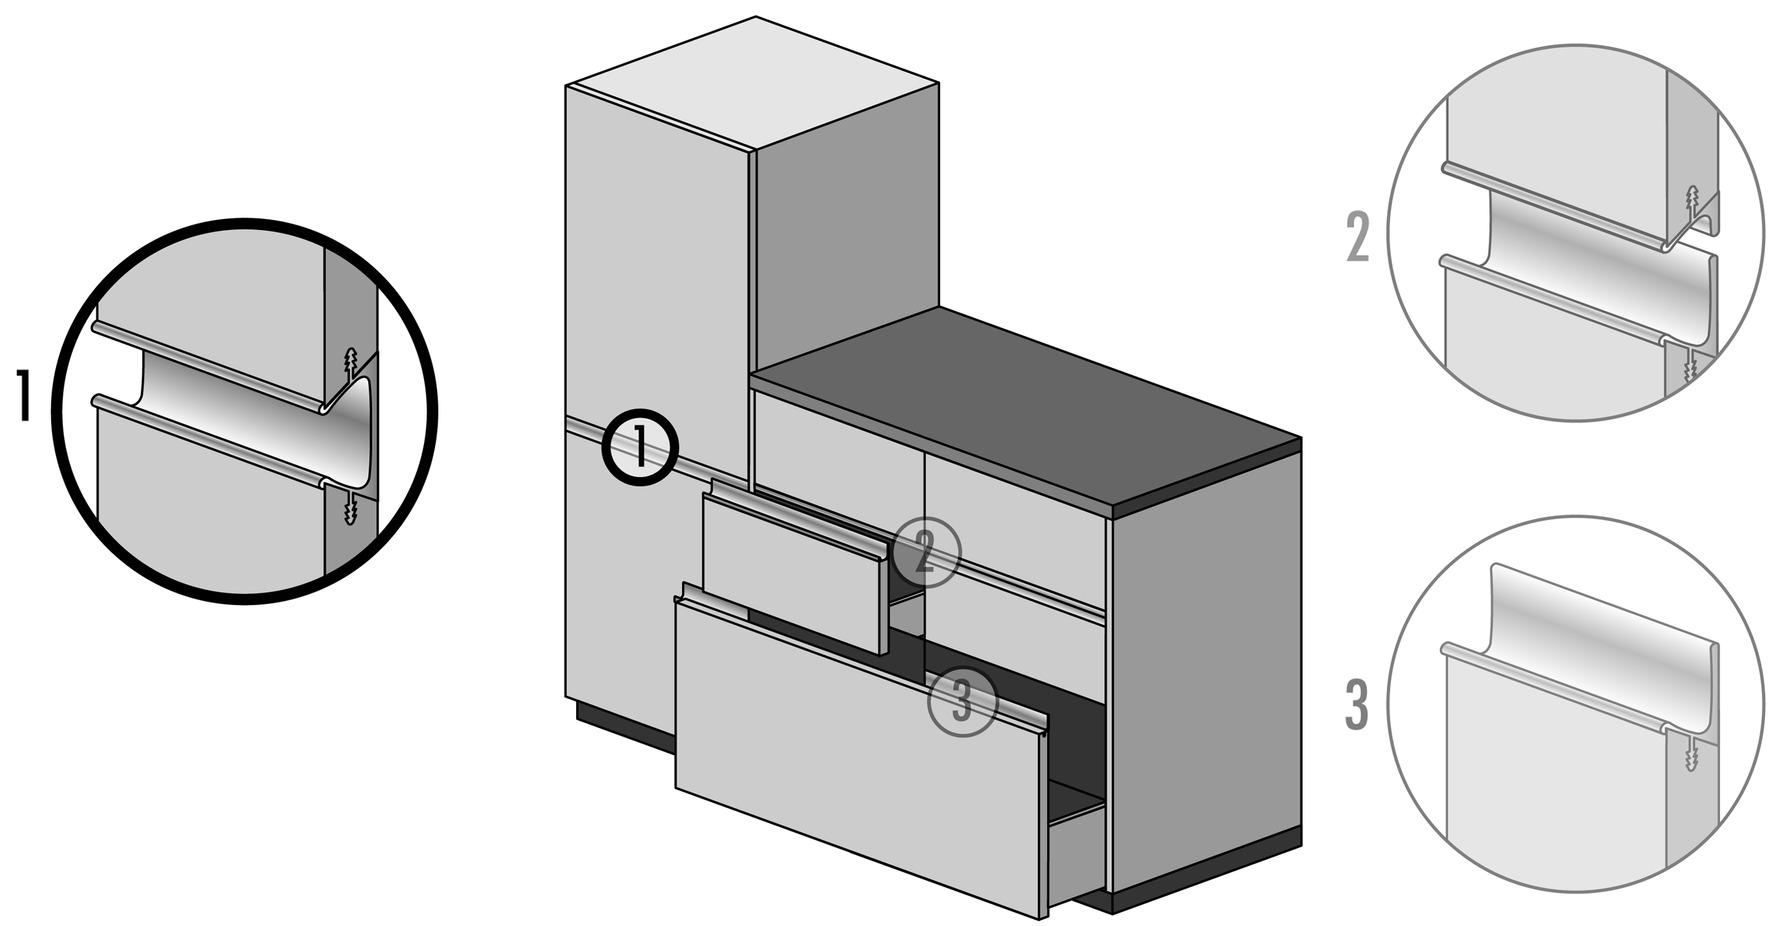 Griffleistenprofile mit Profilhöhe 57 mm